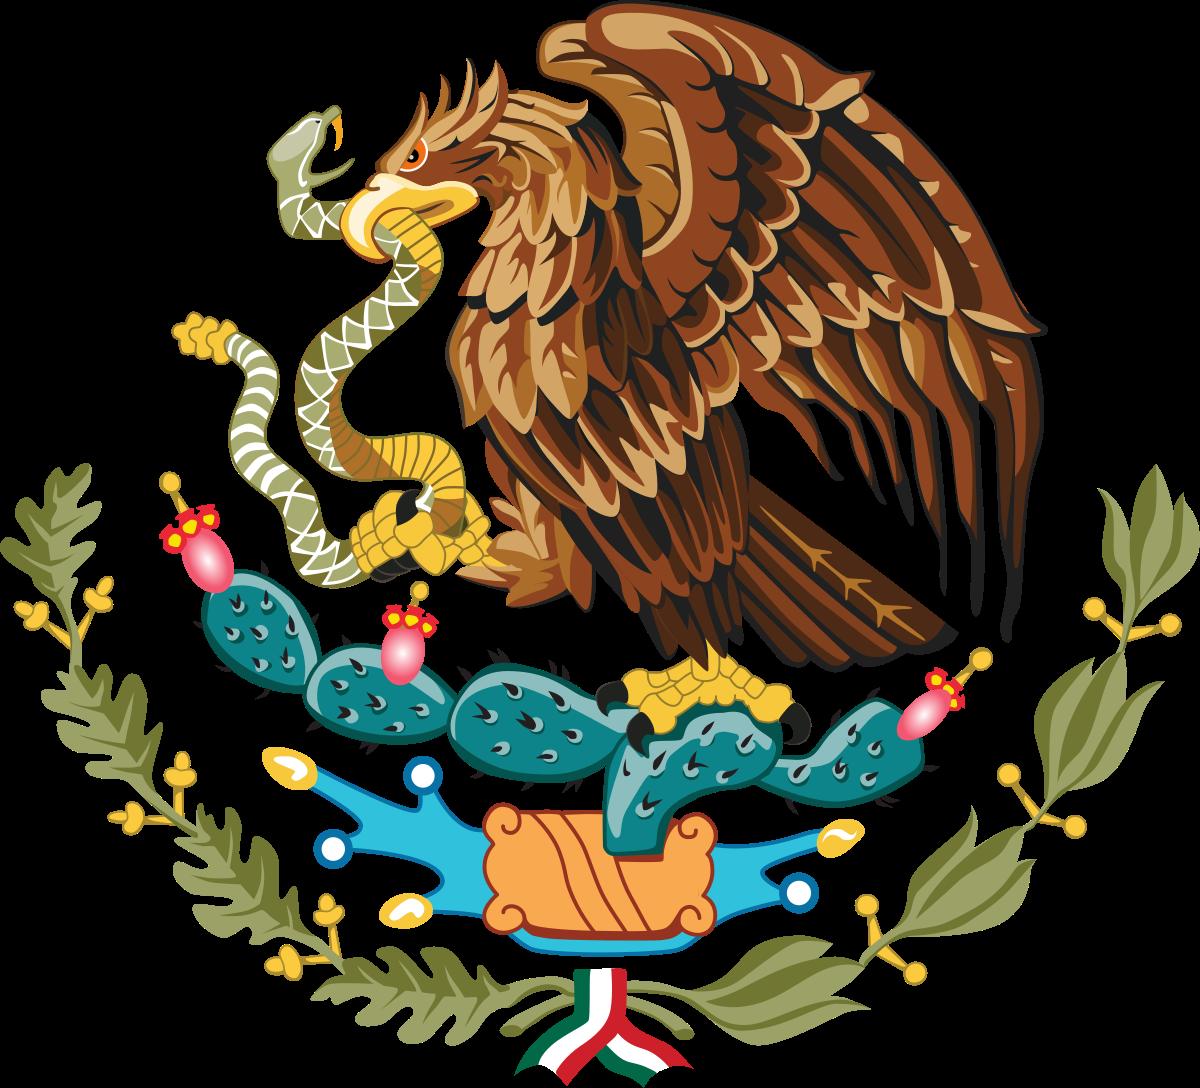 Kazakhstan eagle sun clipart black and white stock Renewable energy in Mexico - Wikipedia black and white stock